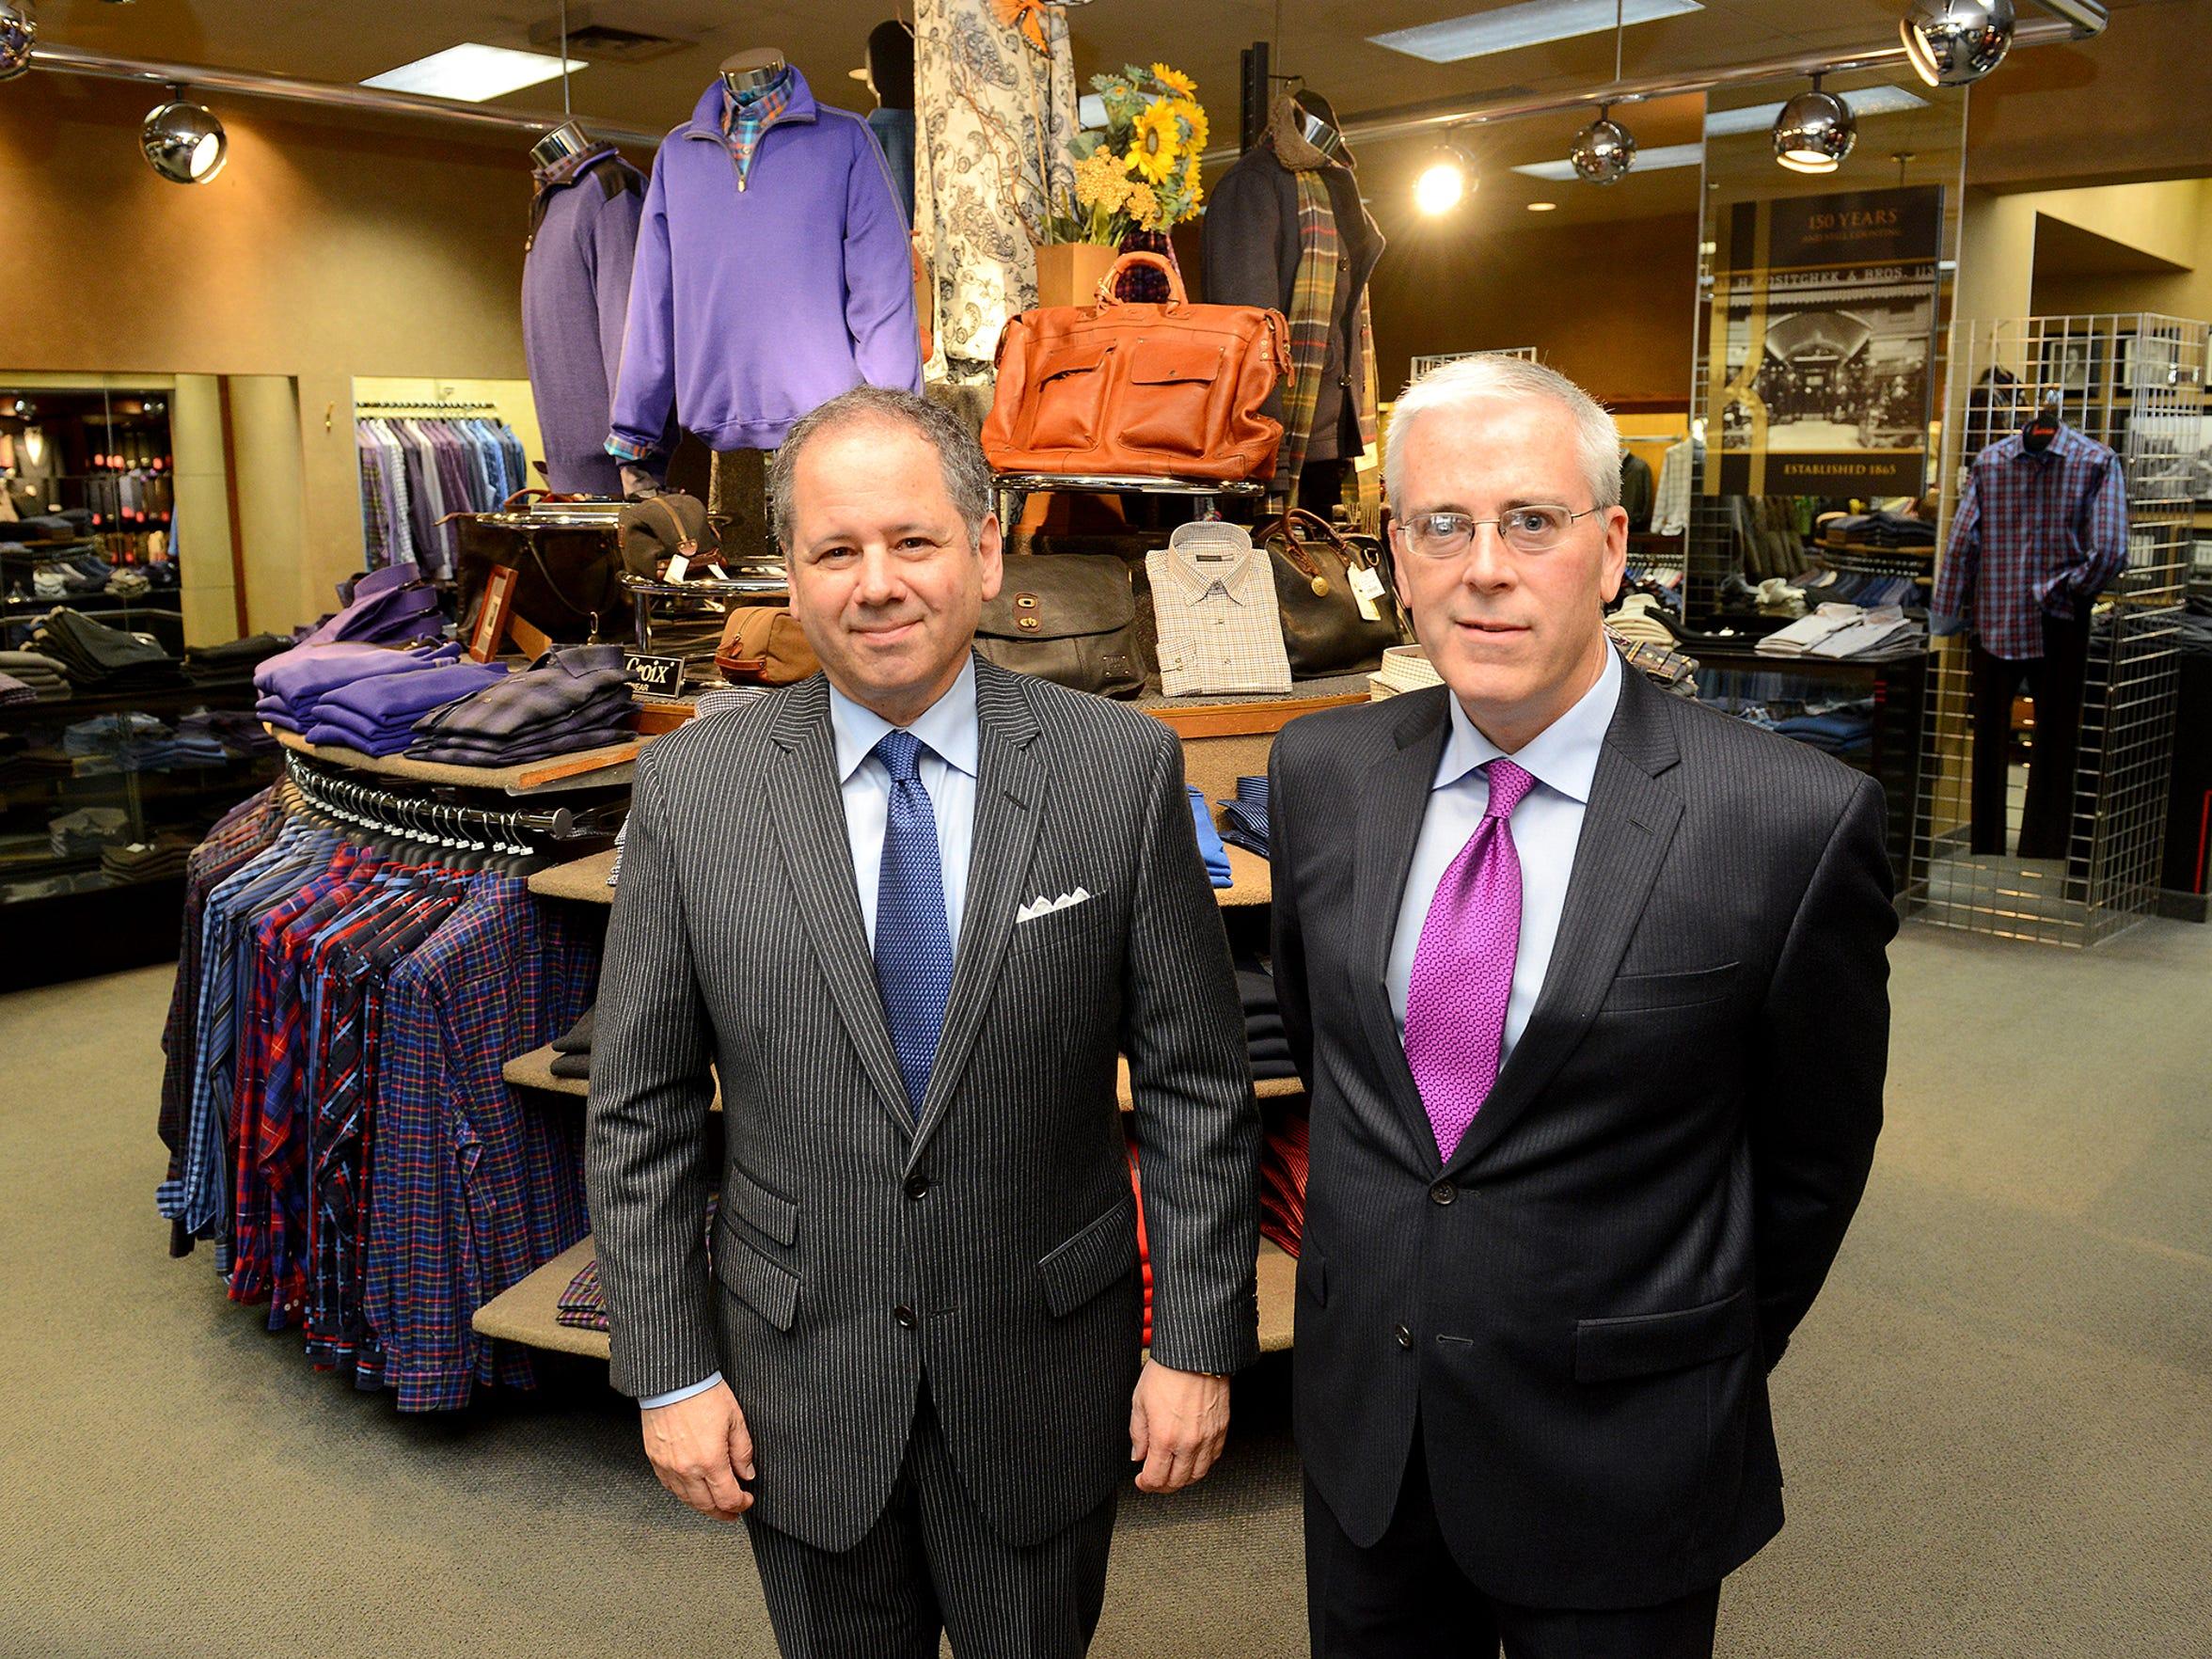 Fourth-generation owner David Kositchek, left, and